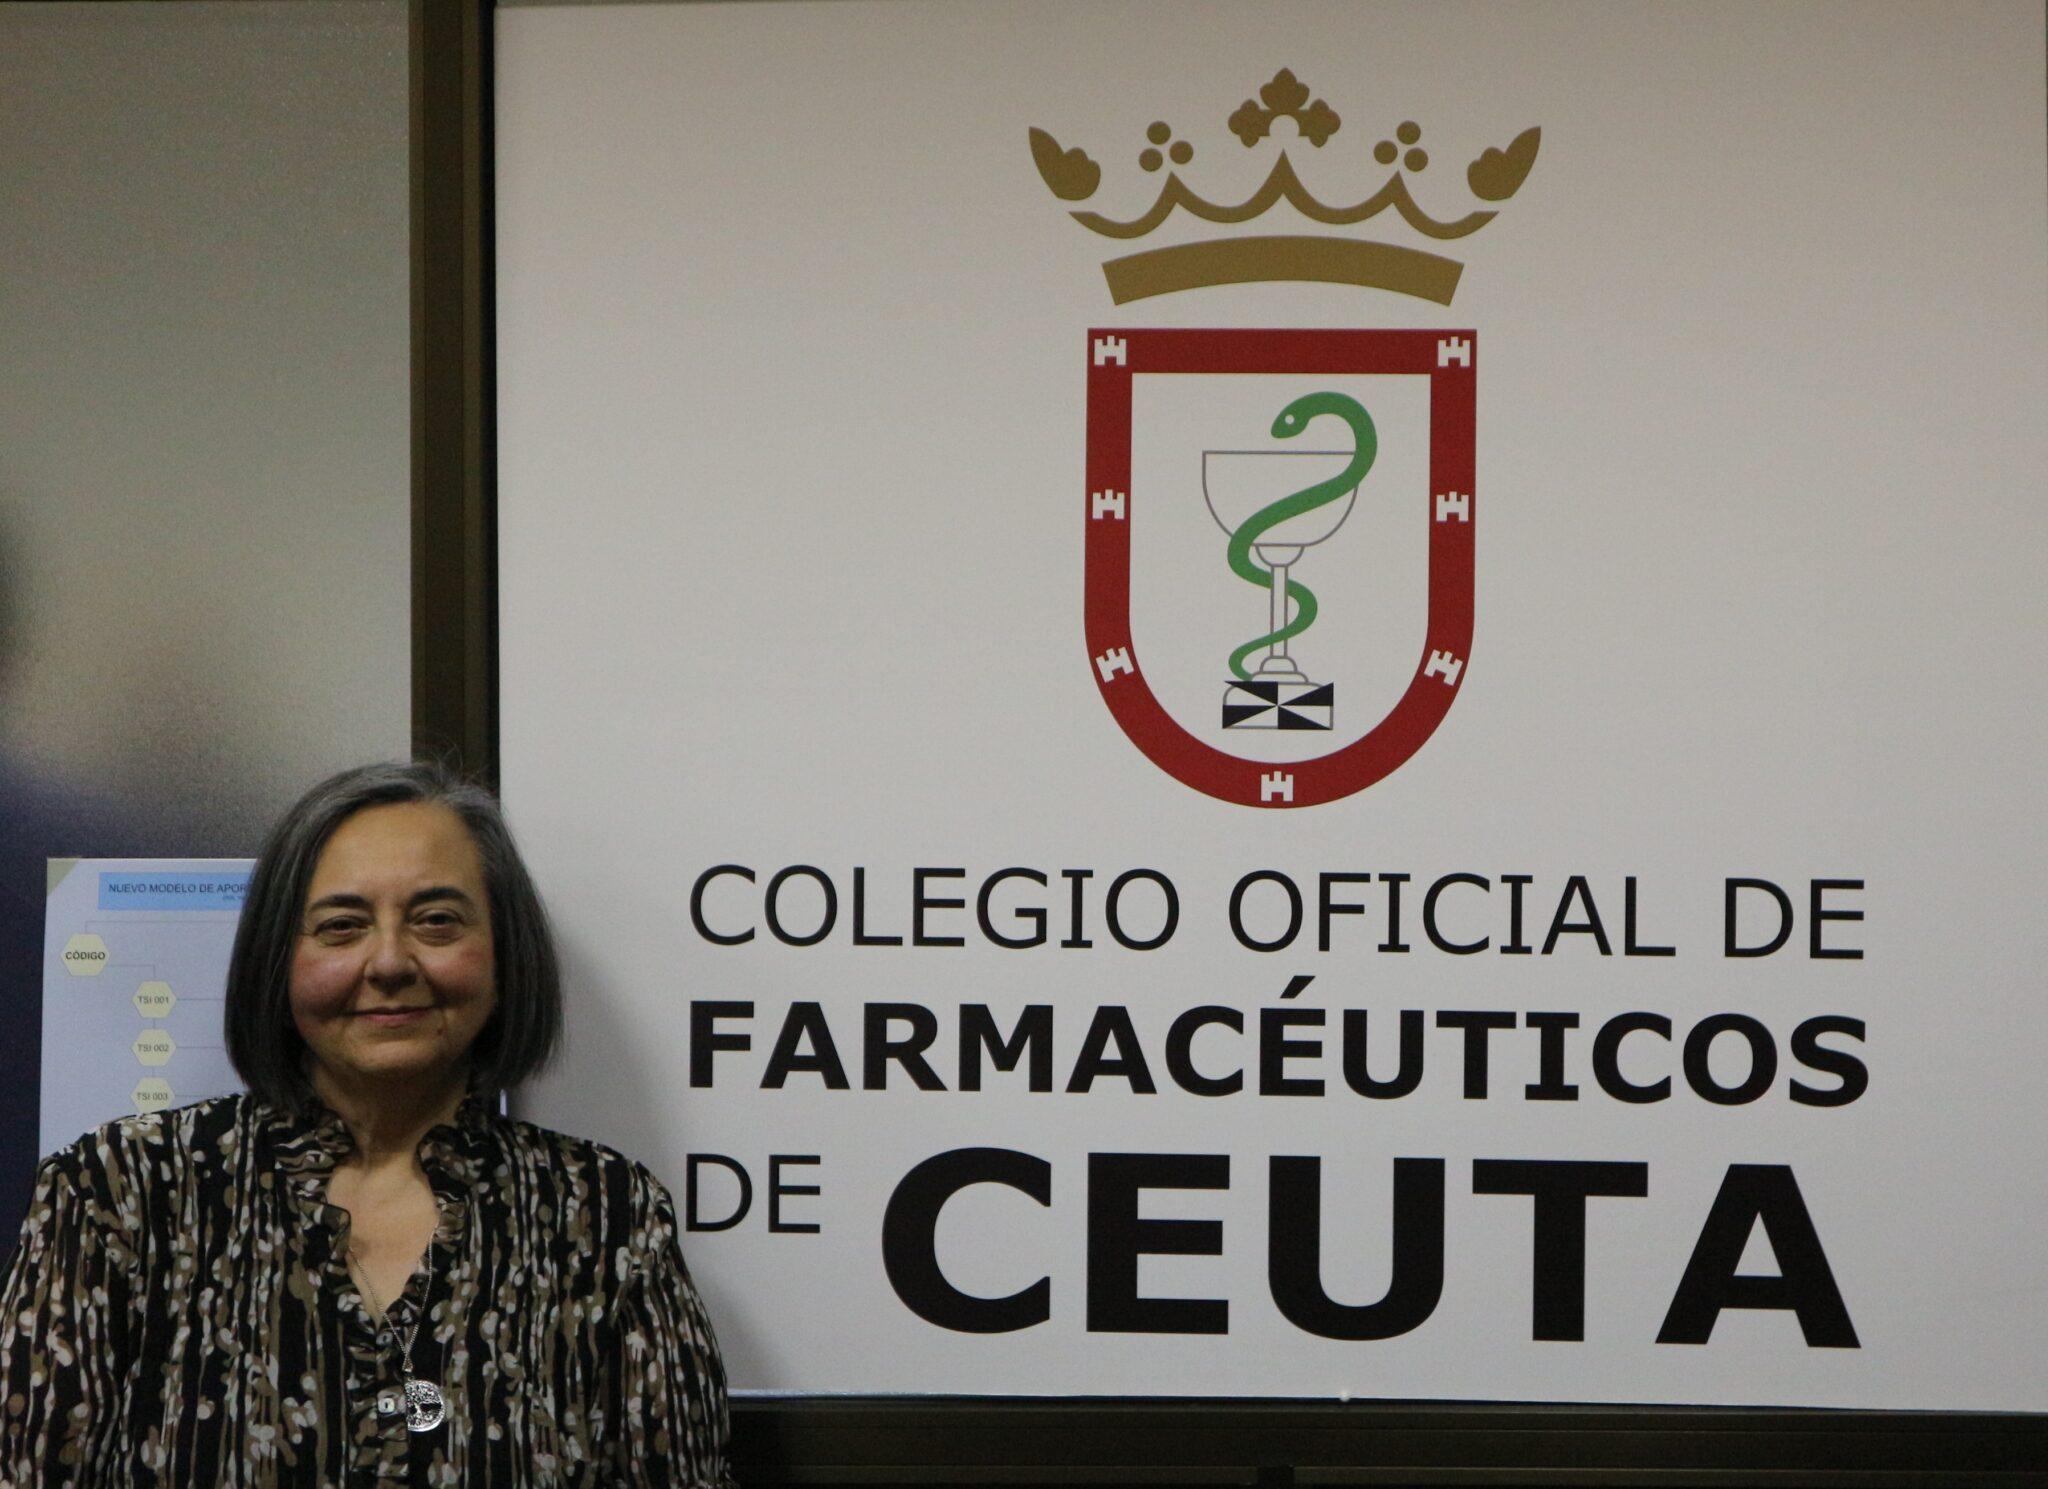 Claudia García Jiménez